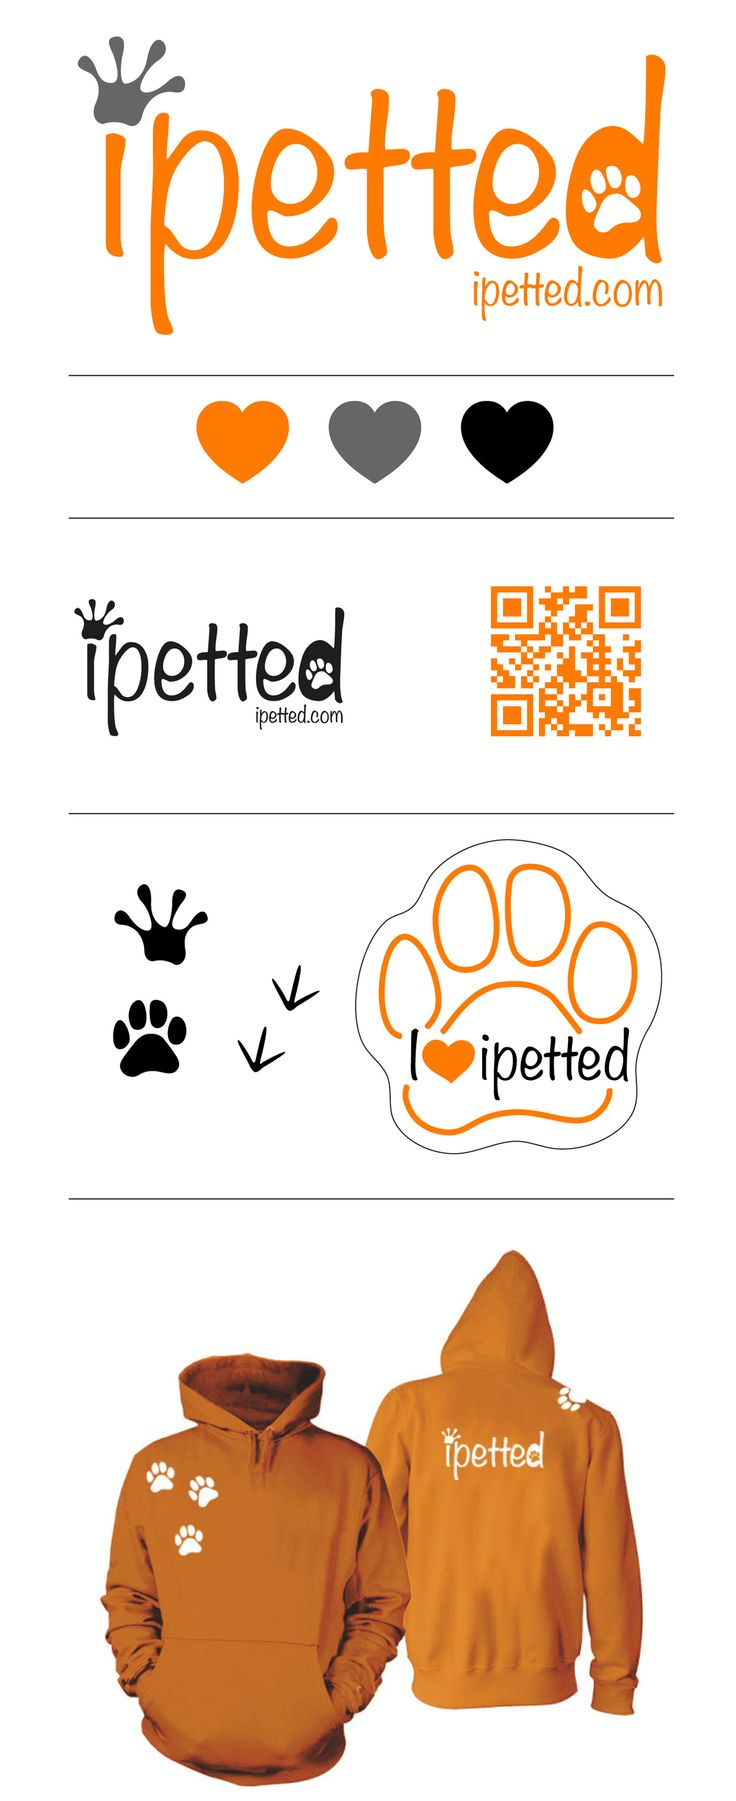 Diseño de imagen corporativa para Red Social de Mascotas. Pajarita Make up.By kata